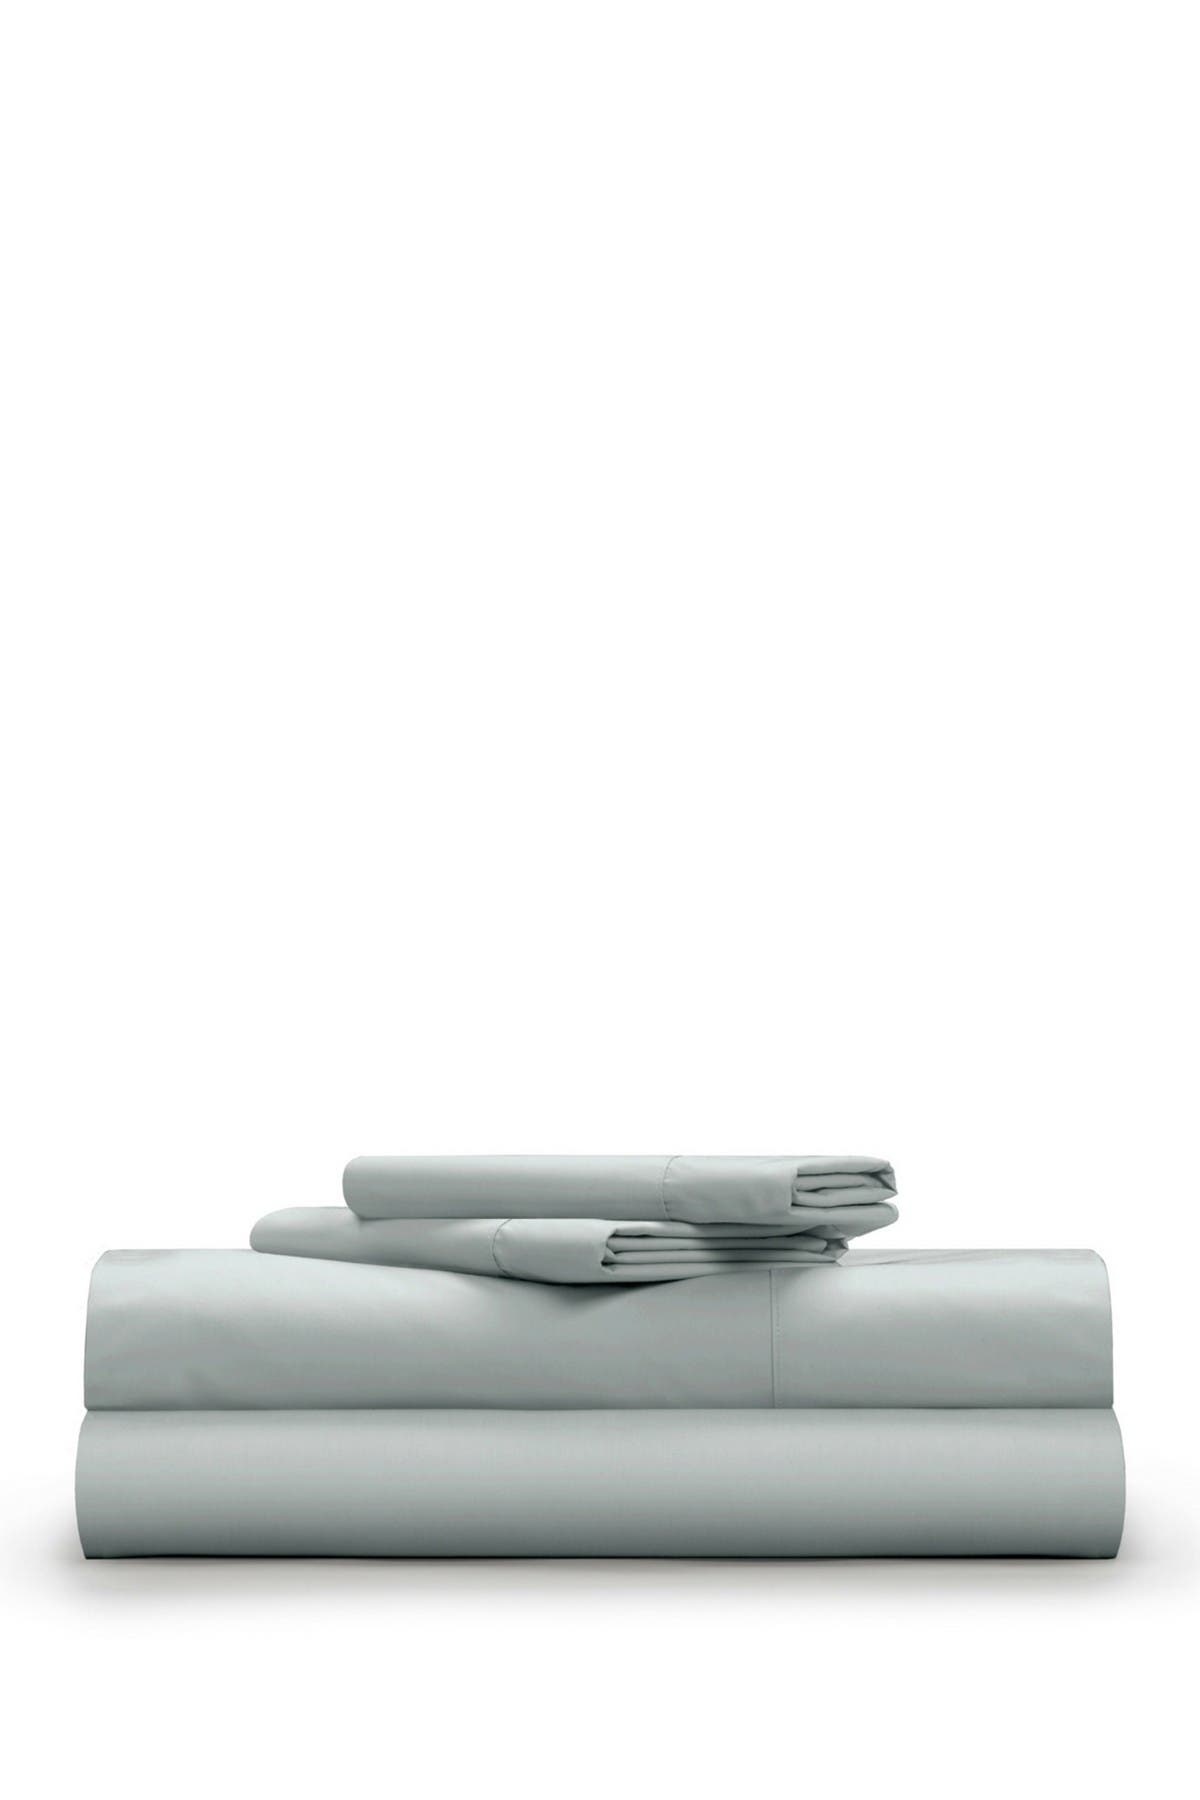 Image of Pillow Guy King Classic Cool & Crisp 100% Cotton Percale Sheet Set - Light Grey